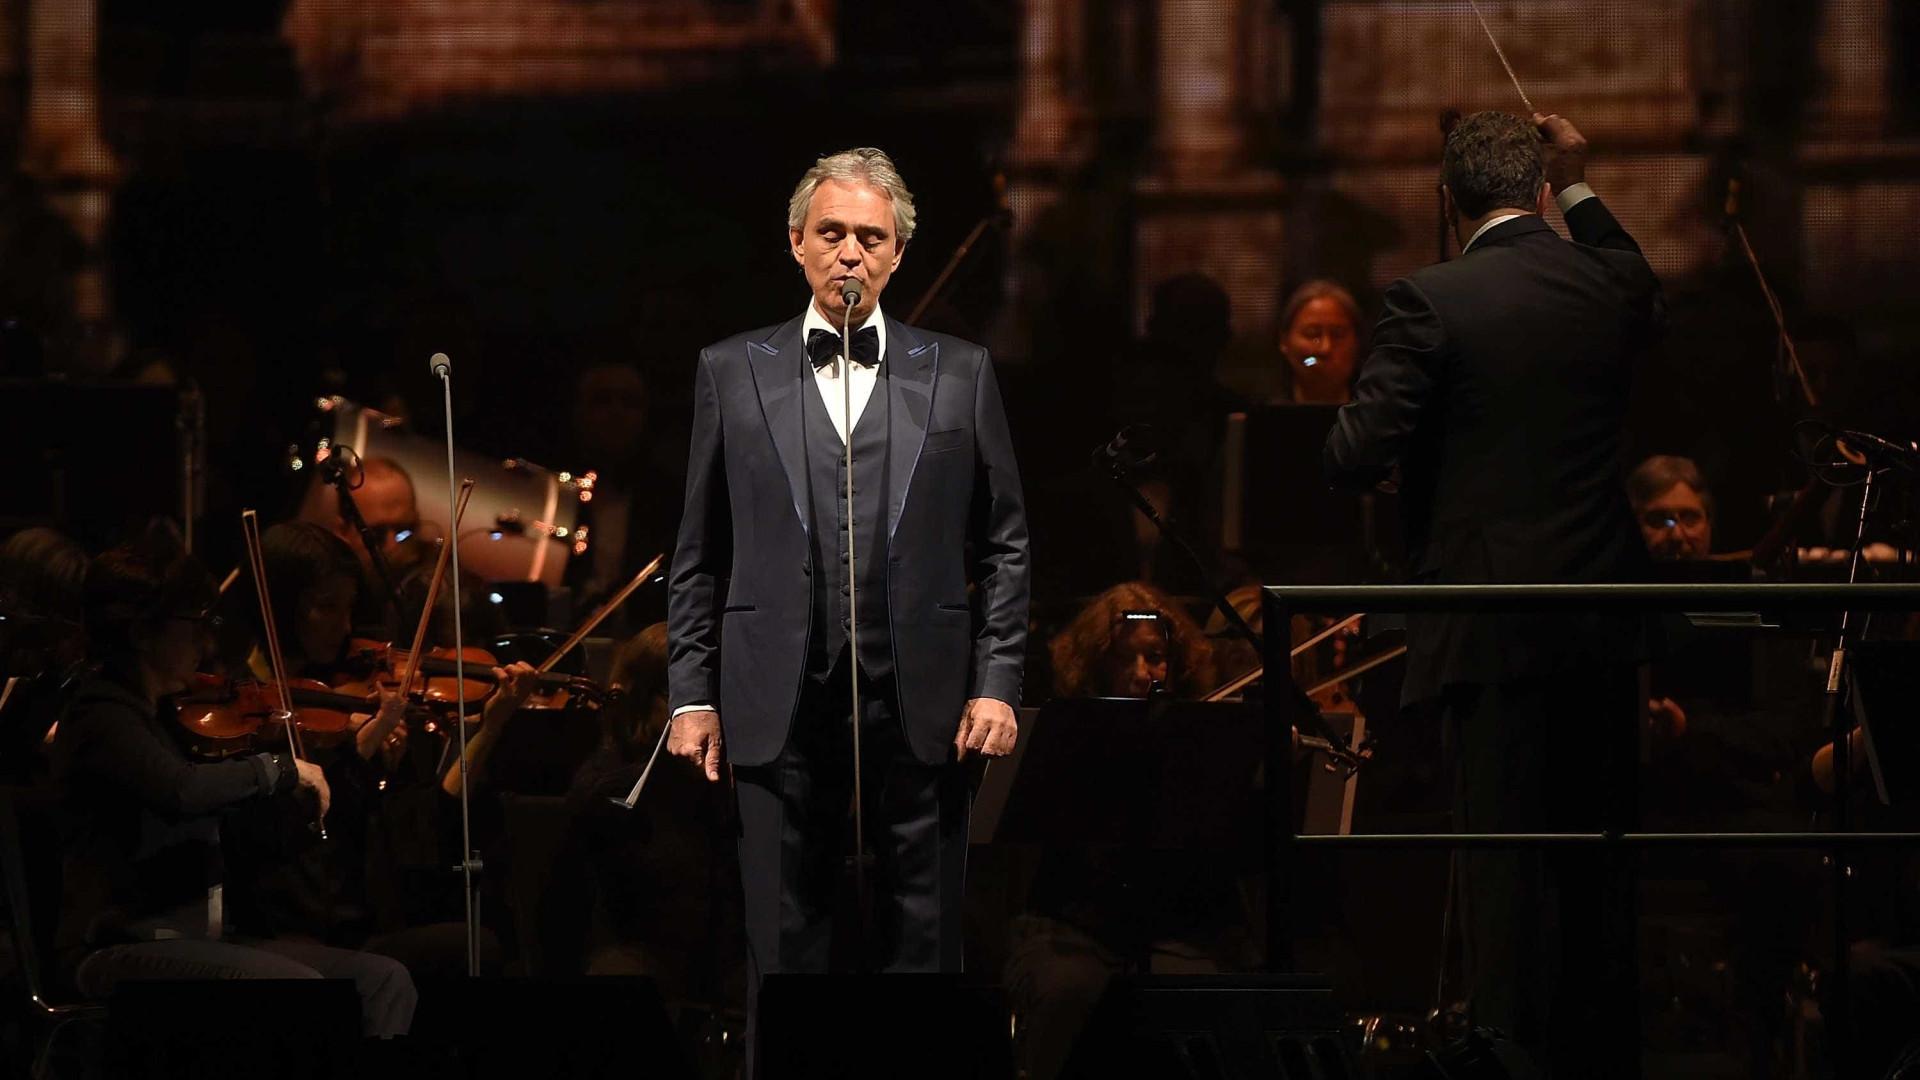 Andrea Bocelli comemora 60 anos e inicia turnê pelo Brasil